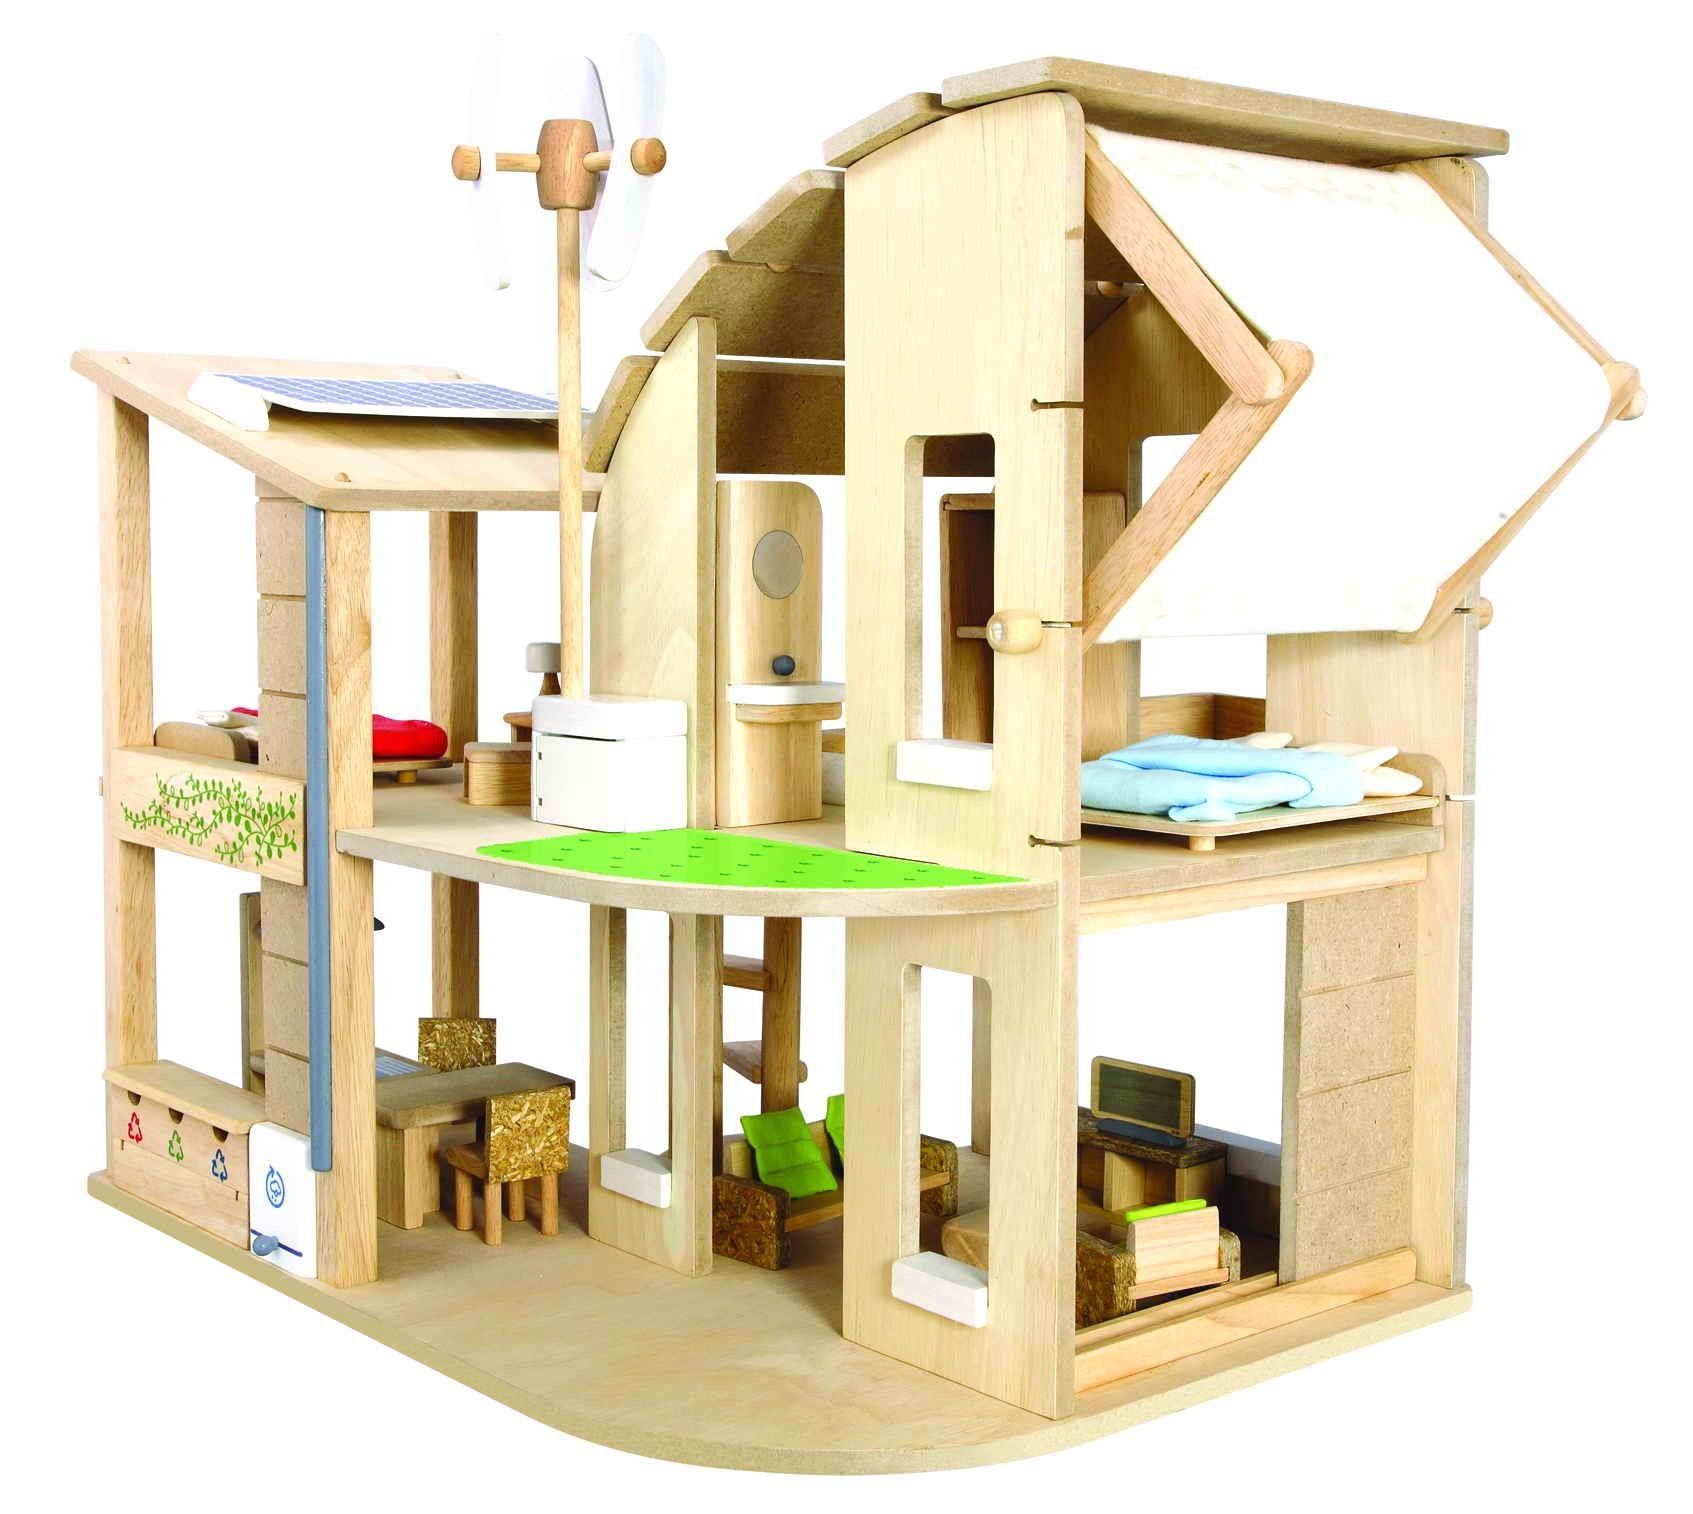 green dollhouse with furniture  plan toys  試してみたいこと  - green dollhouse with furniture  plan toys